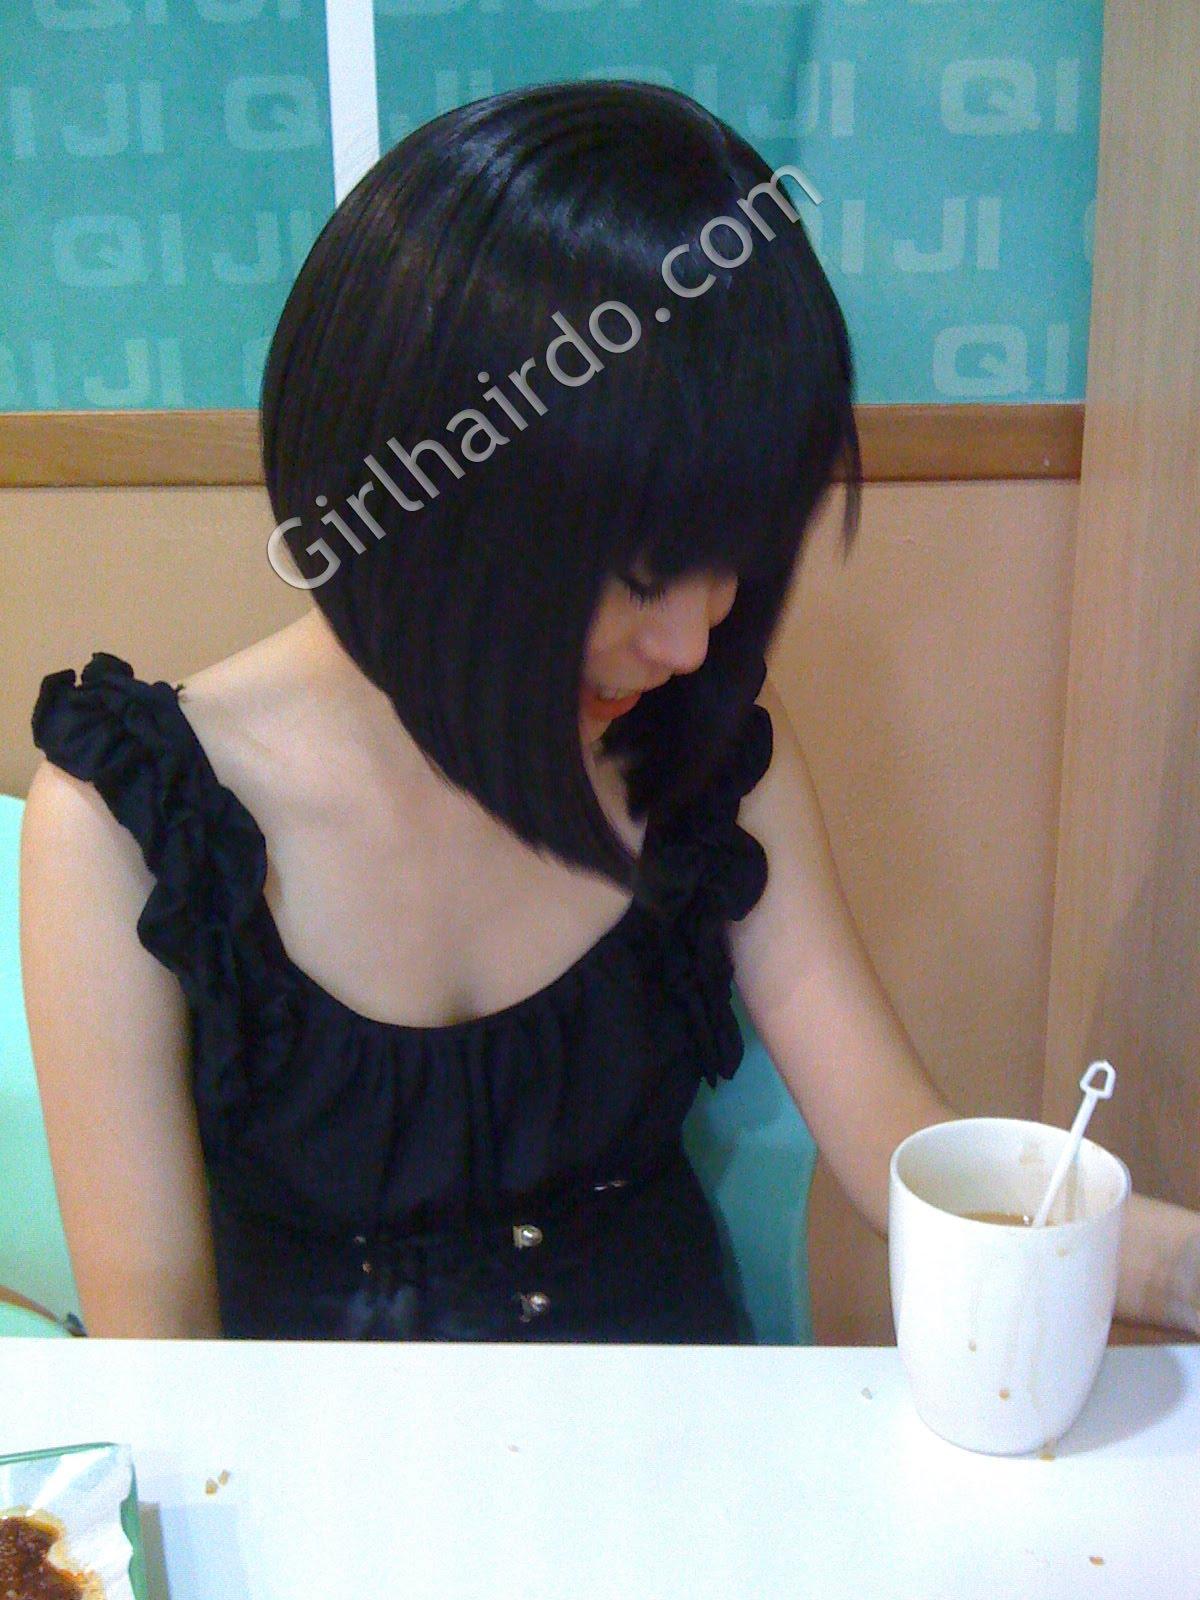 http://4.bp.blogspot.com/-0OuEofbxzUs/TjGhDeMjeJI/AAAAAAAACbo/PTmZ-5wqHJE/s1600/IMG_3468..jpg